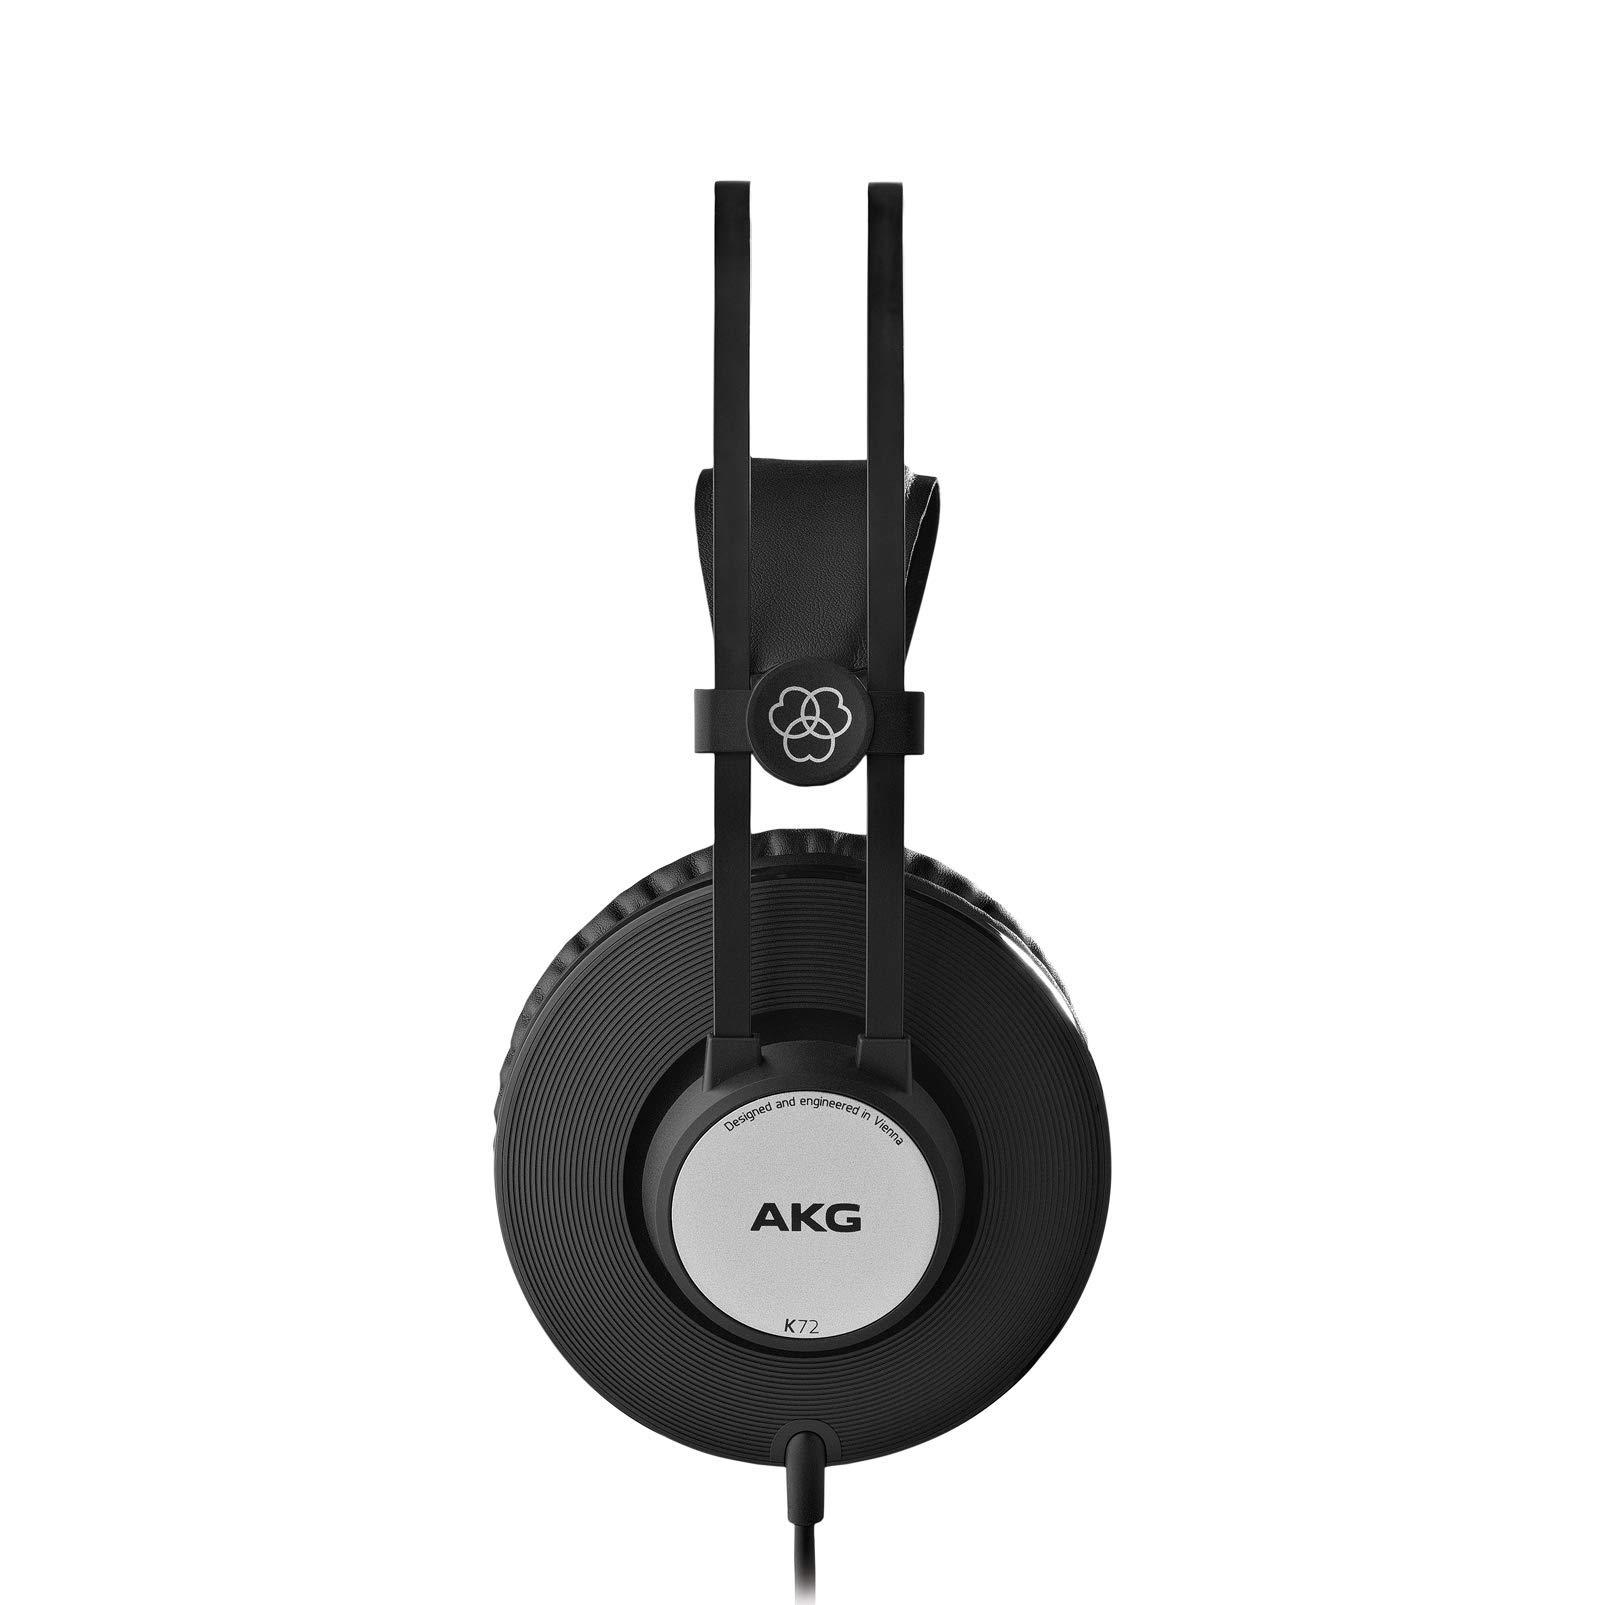 AKG Pro Audio AKG K72 CLOSED-BACK STUDIO HEADPHONES (